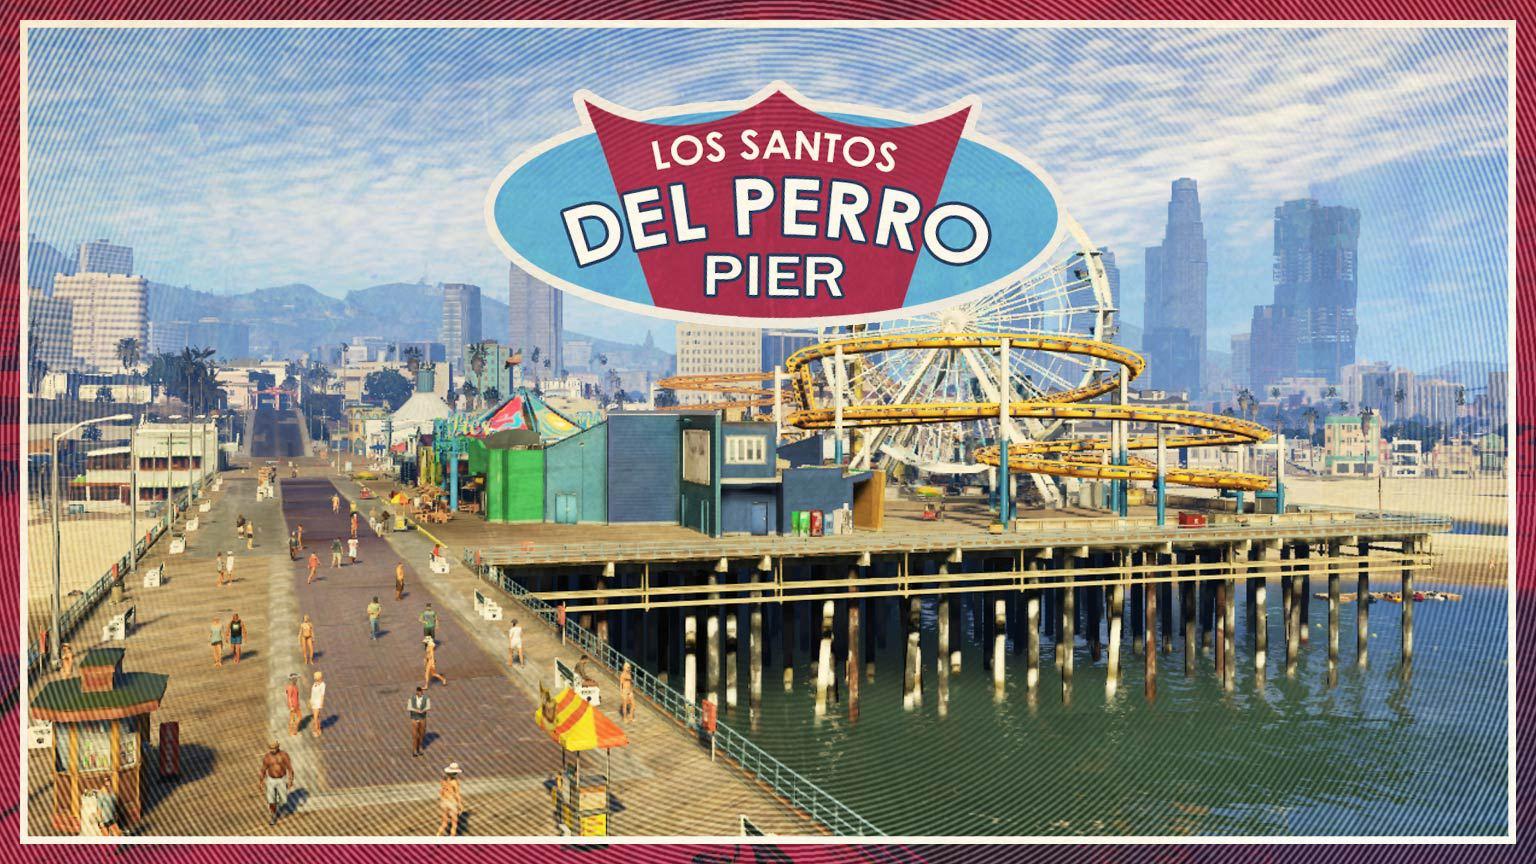 Del-Perro-Pier-Durchsagen